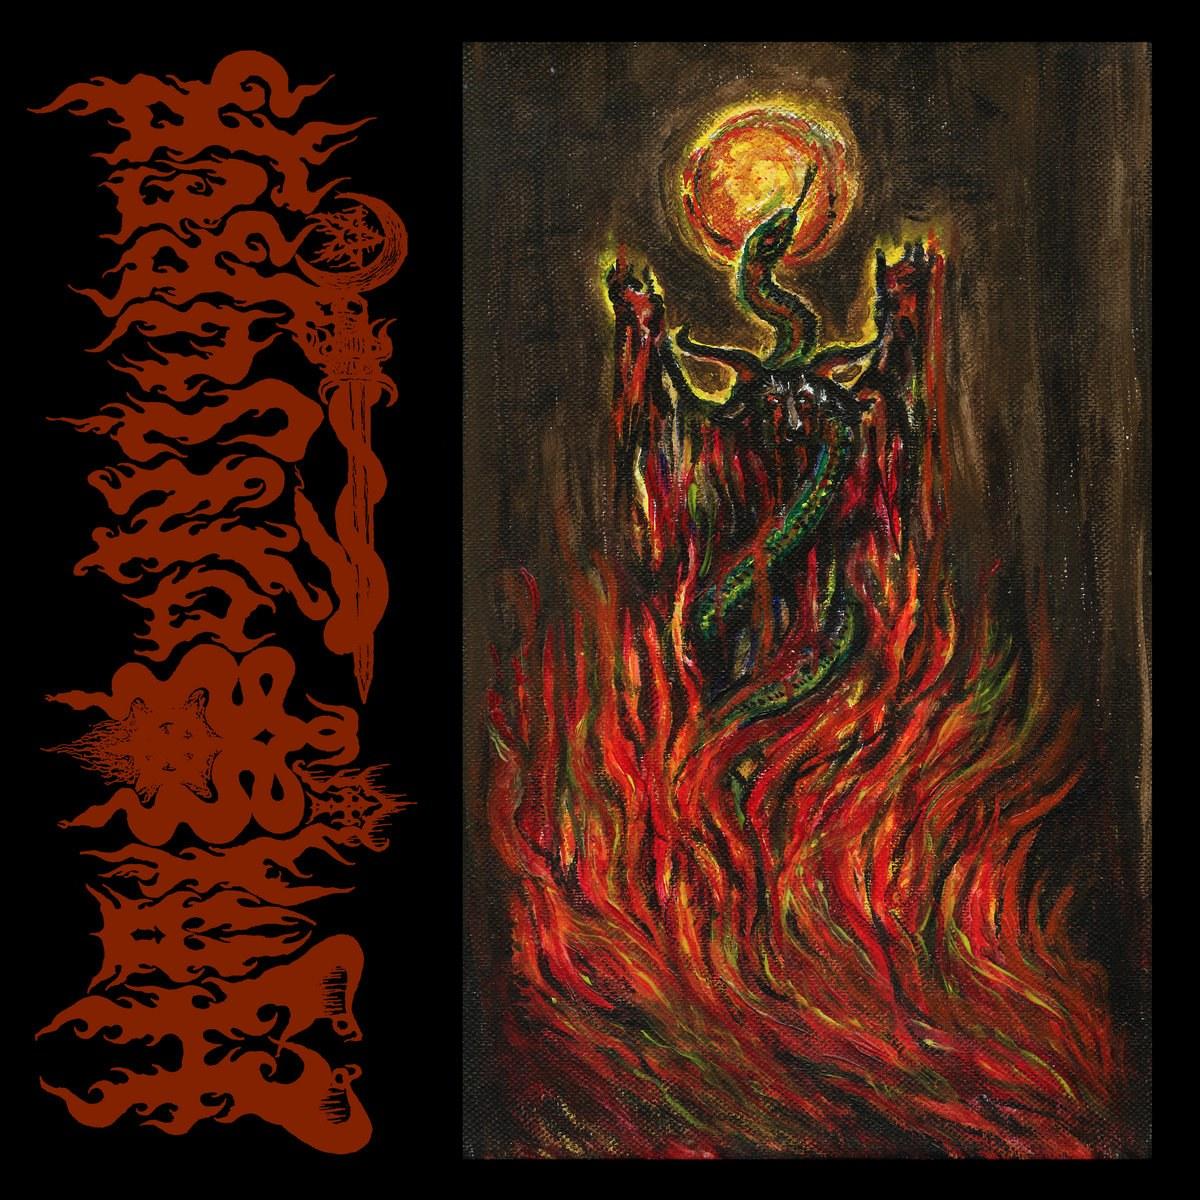 Hail Conjurer - Hail & Fire